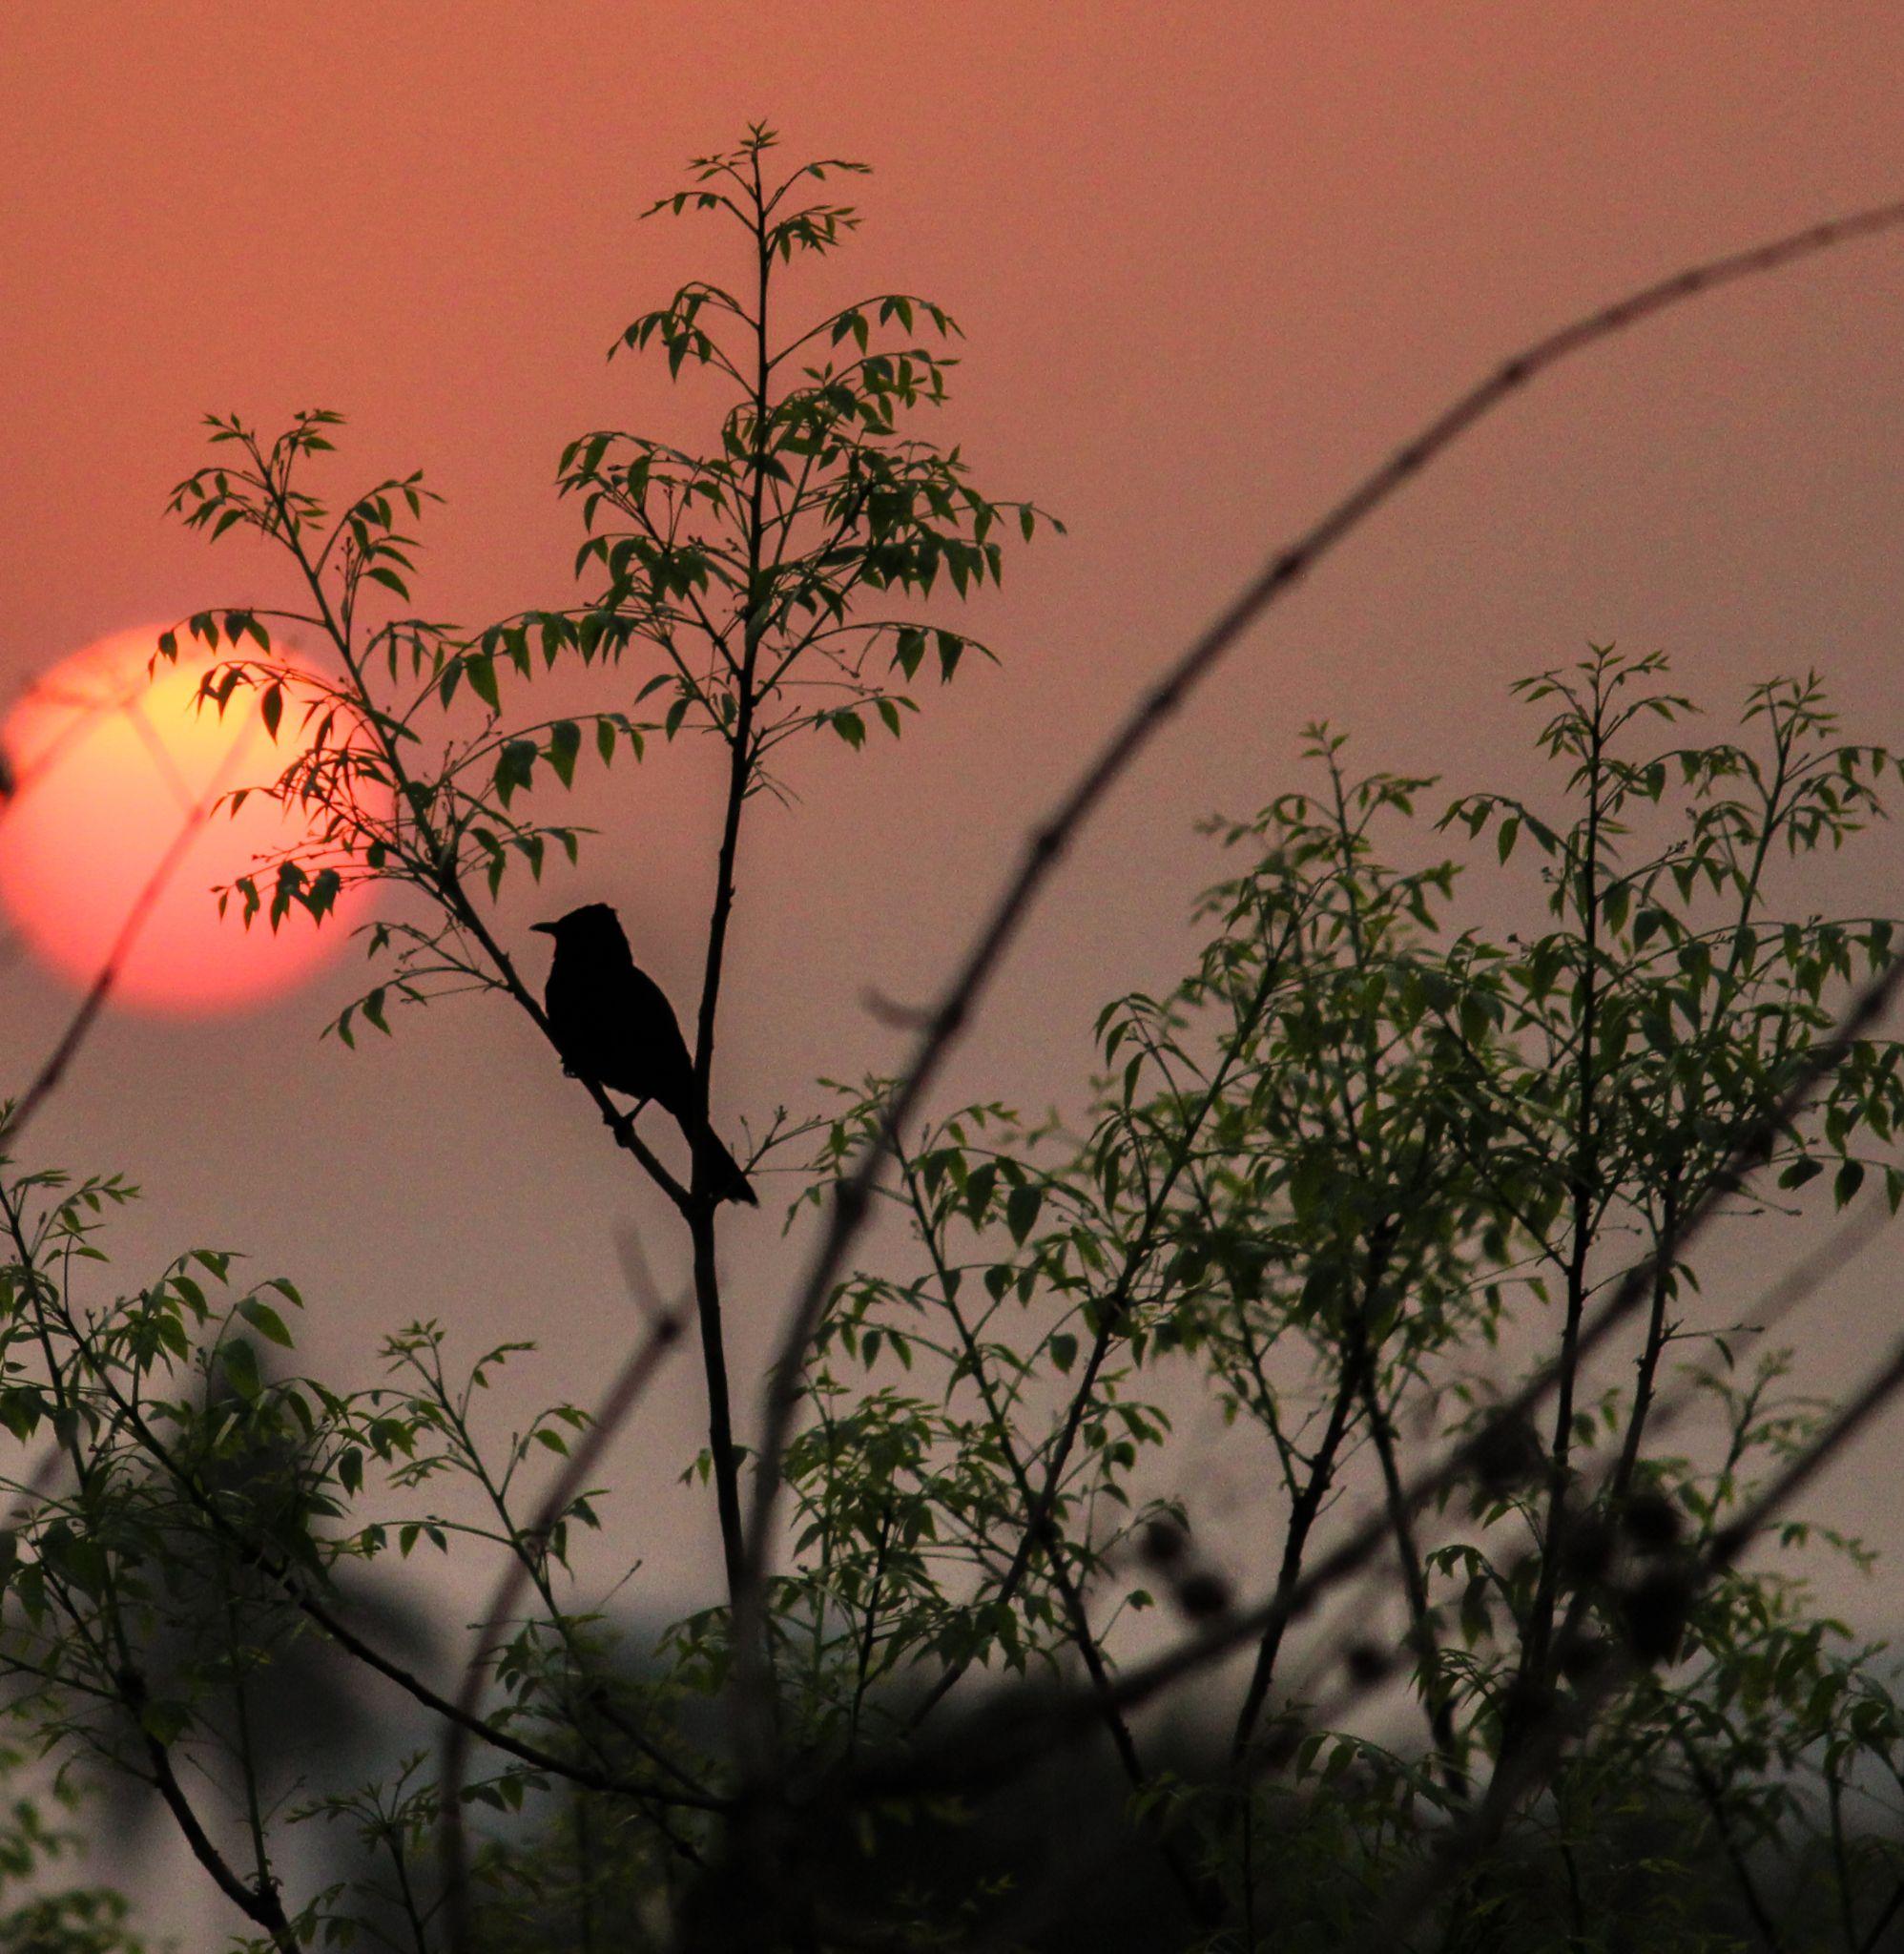 shadowlights  by Anirban Banerjee